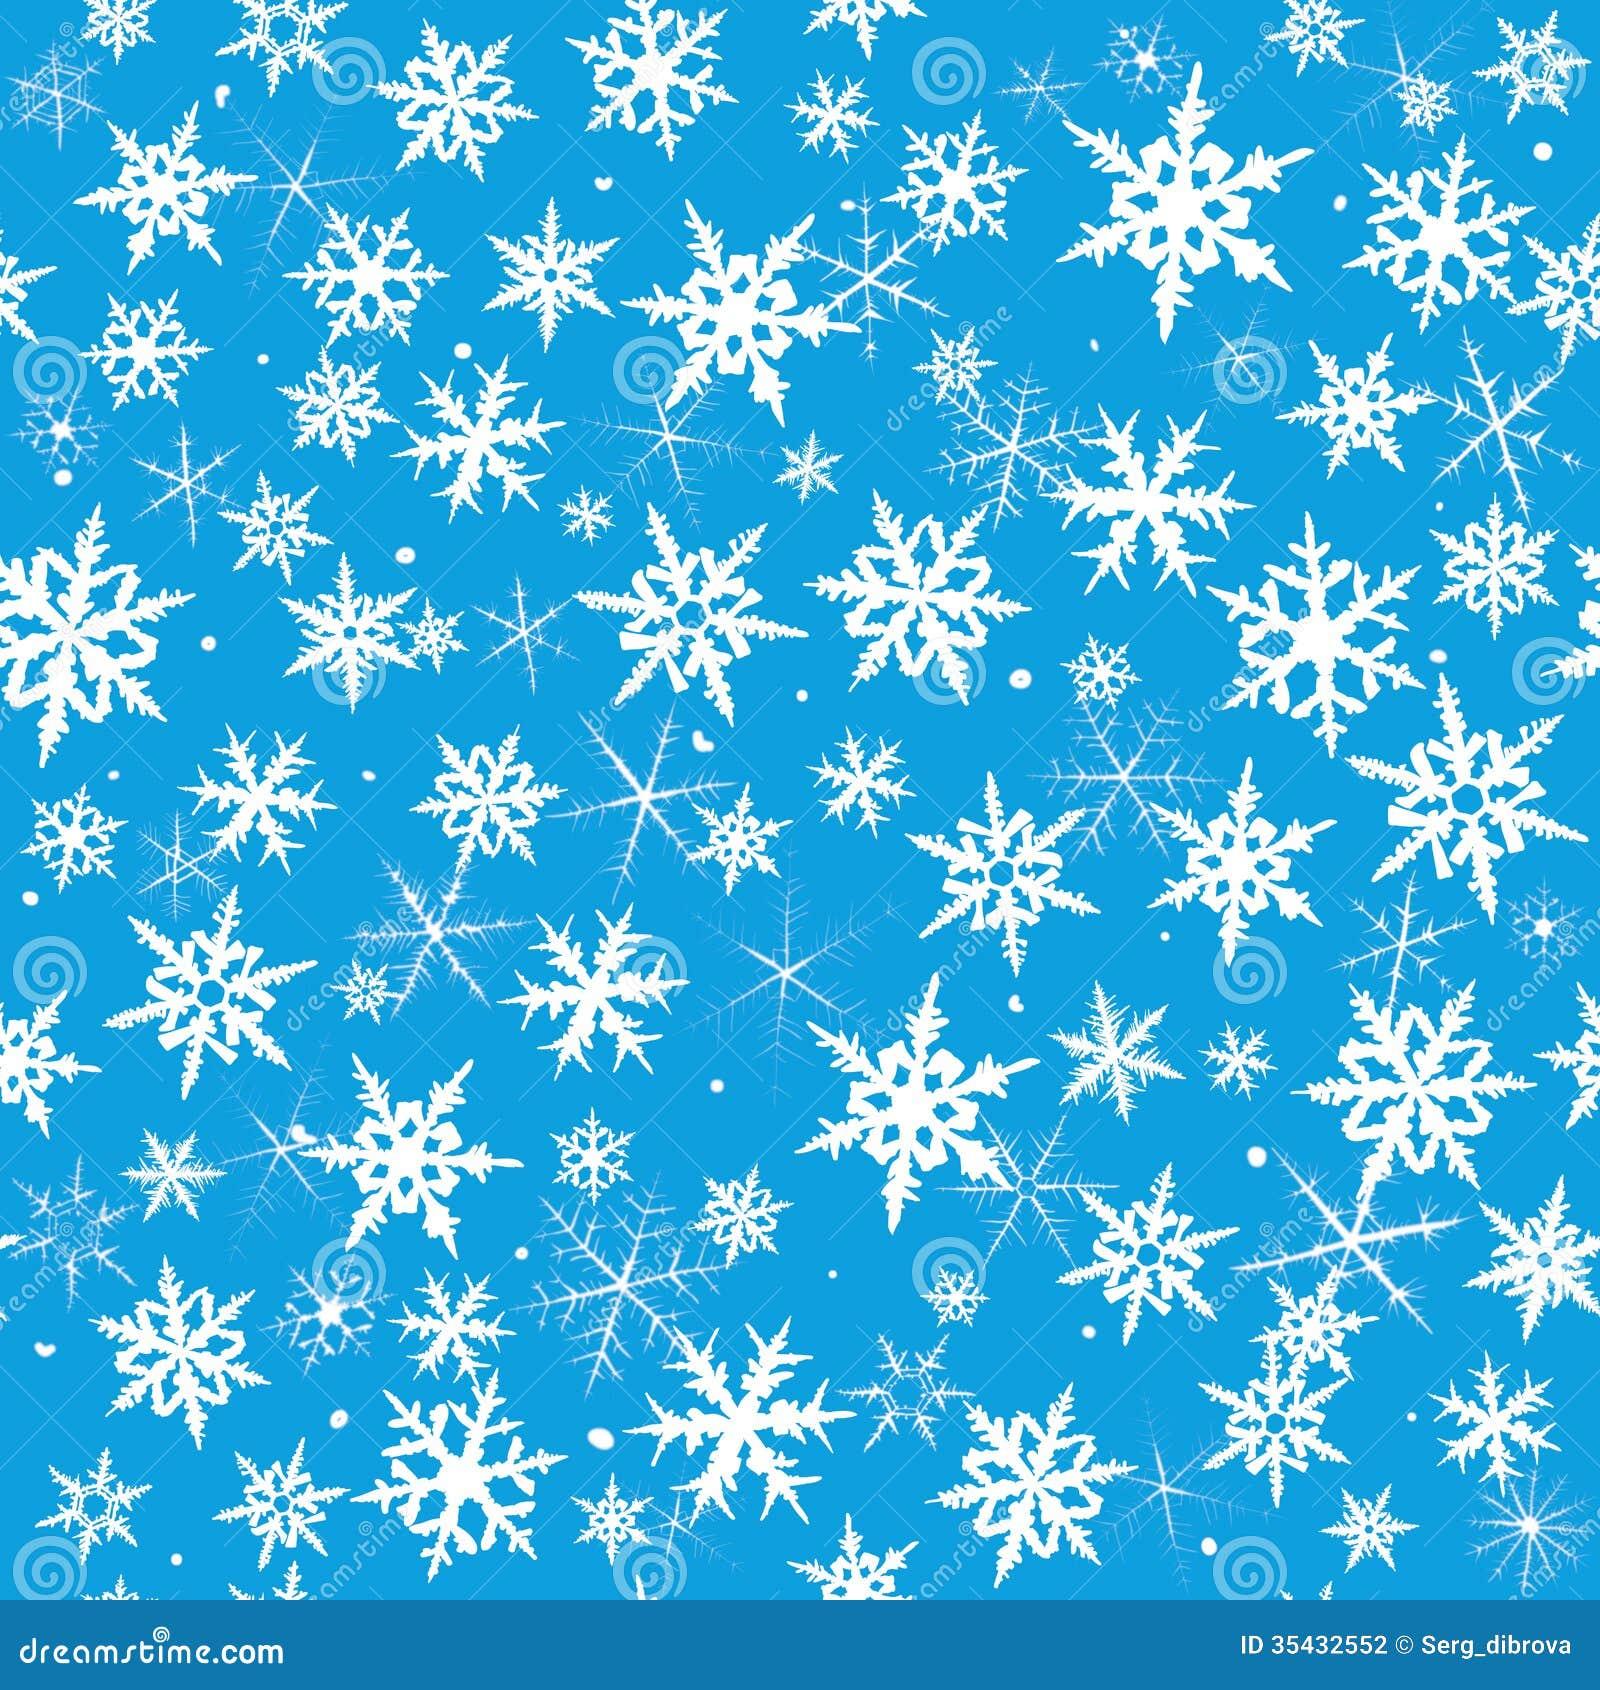 Seamless Snowflakes Stock Photography - Image: 35432552